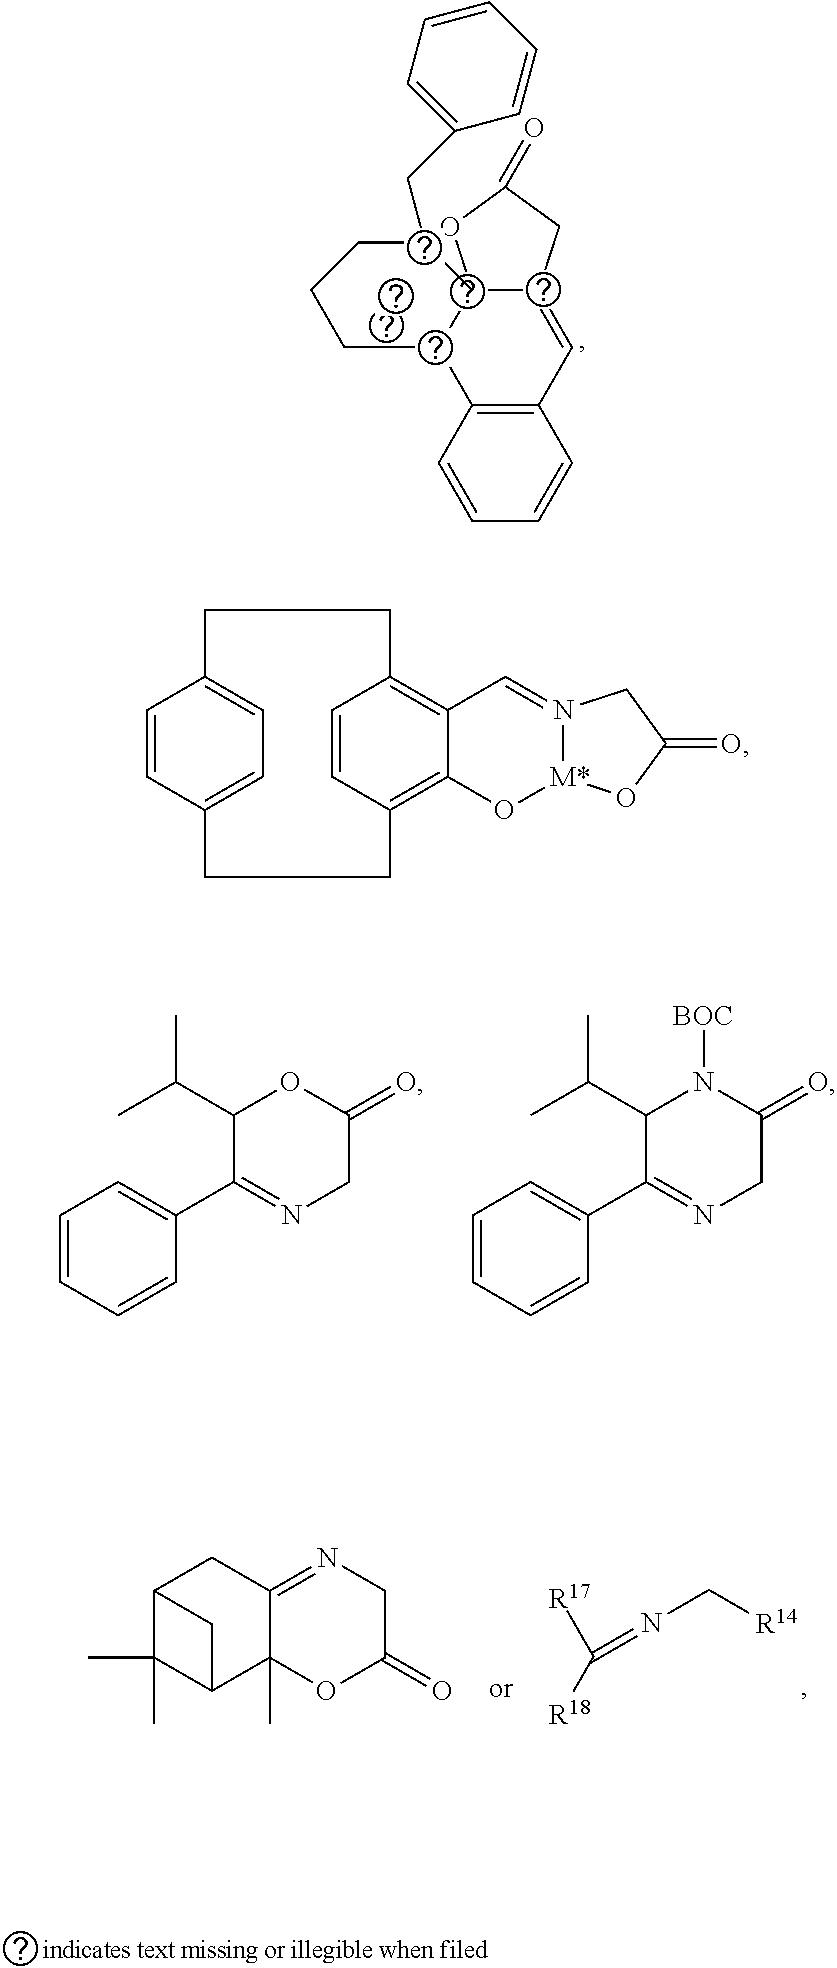 Us20140294763a1 Peptidomimetic Protease Inhibitors Google Patents Wiring Diagram Lowe 165 Fm Figure 20141002 C00024